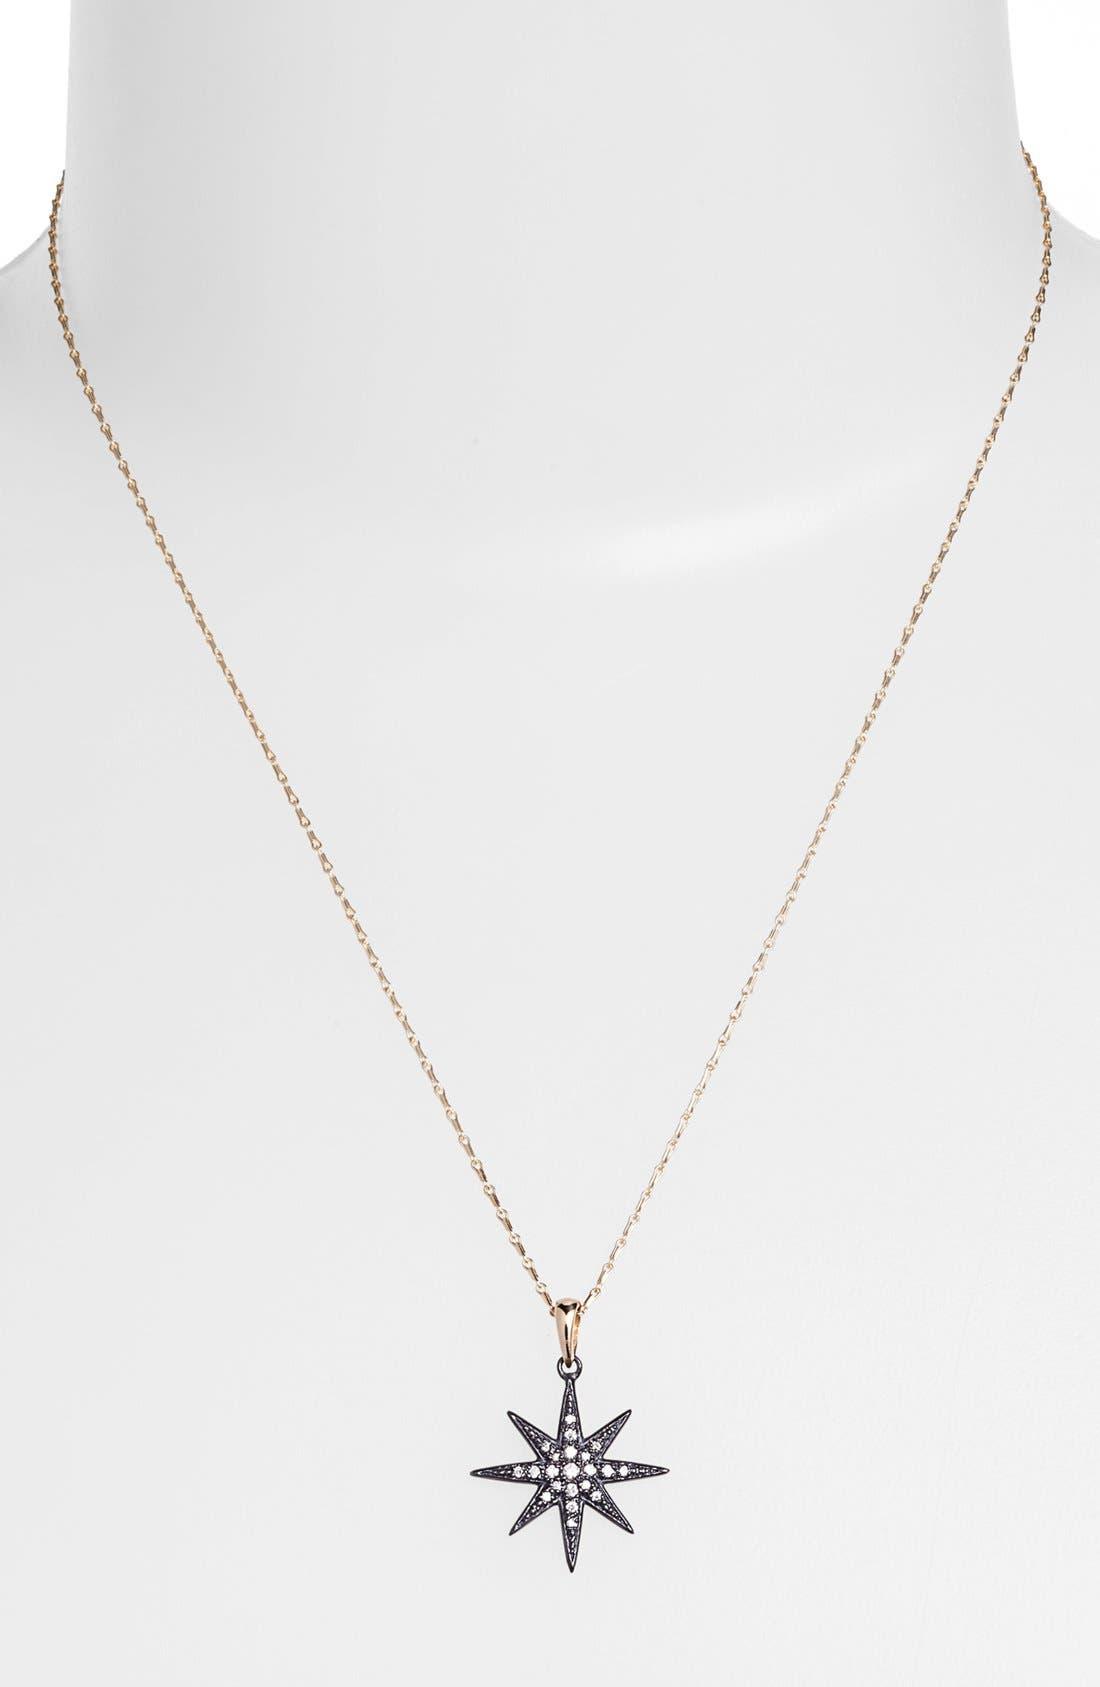 Alternate Image 1 Selected - Mizuki 'Icicles' Diamond Star Pendant Necklace